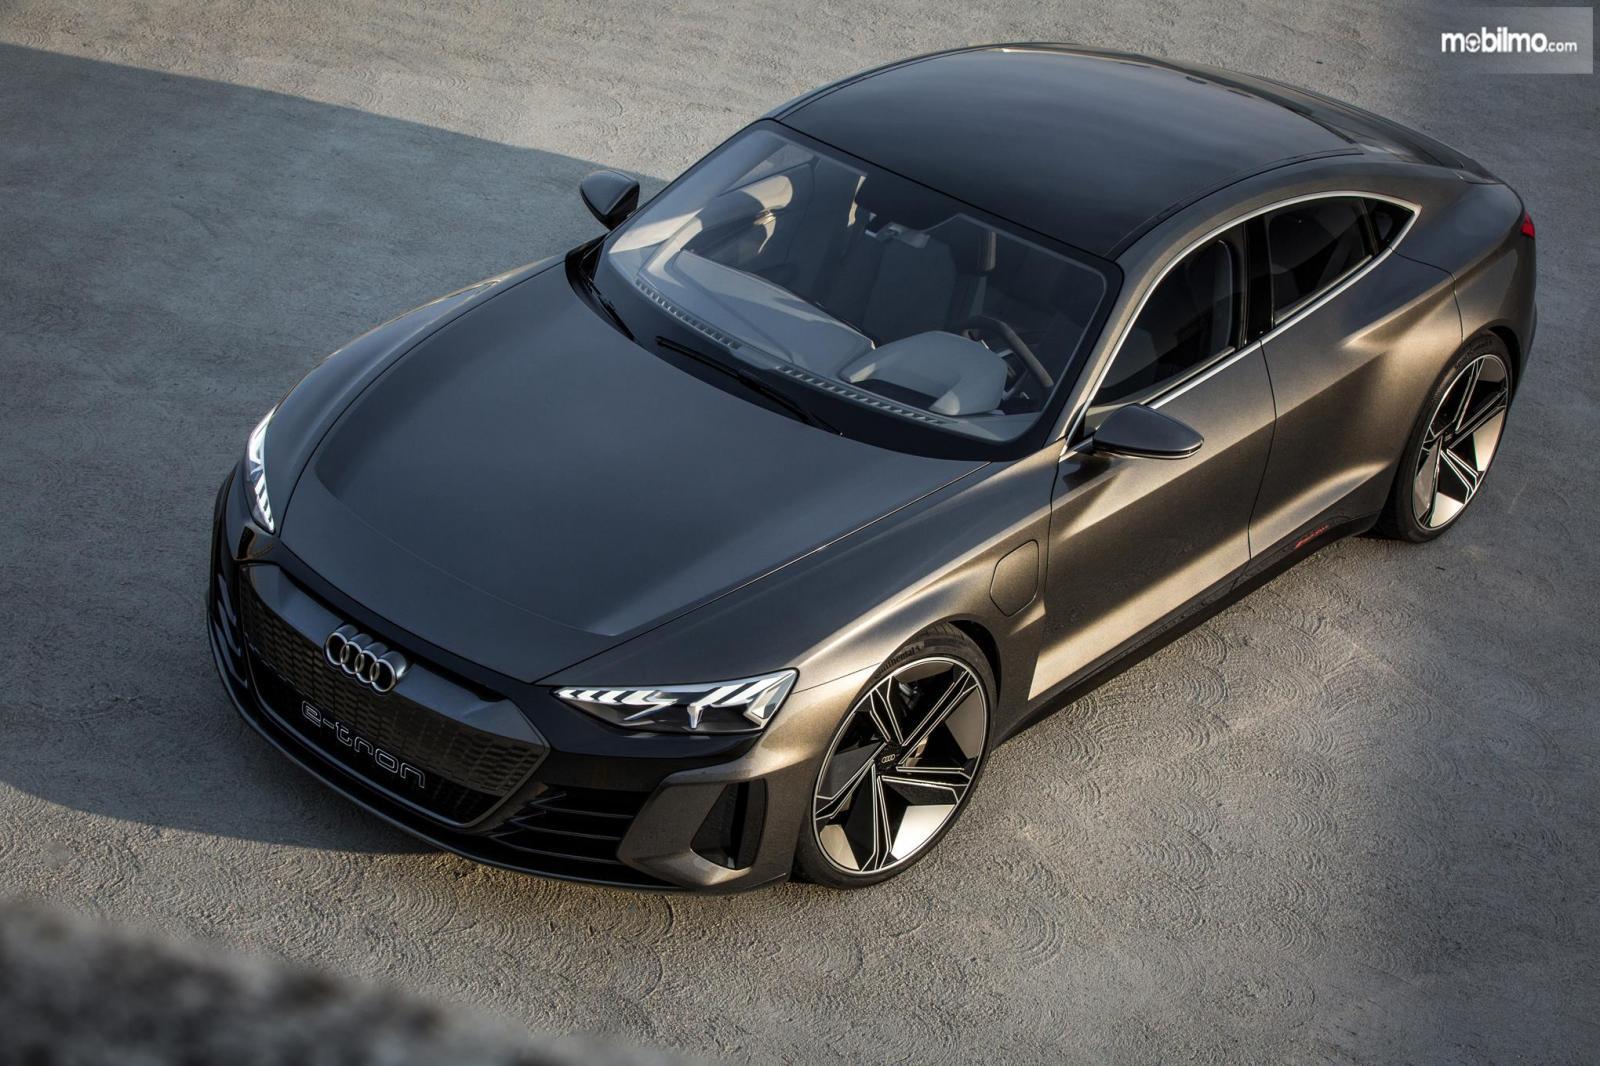 Gambar menunjukkan mobil Audi e-tron GT 2019 berwarna abu-abu